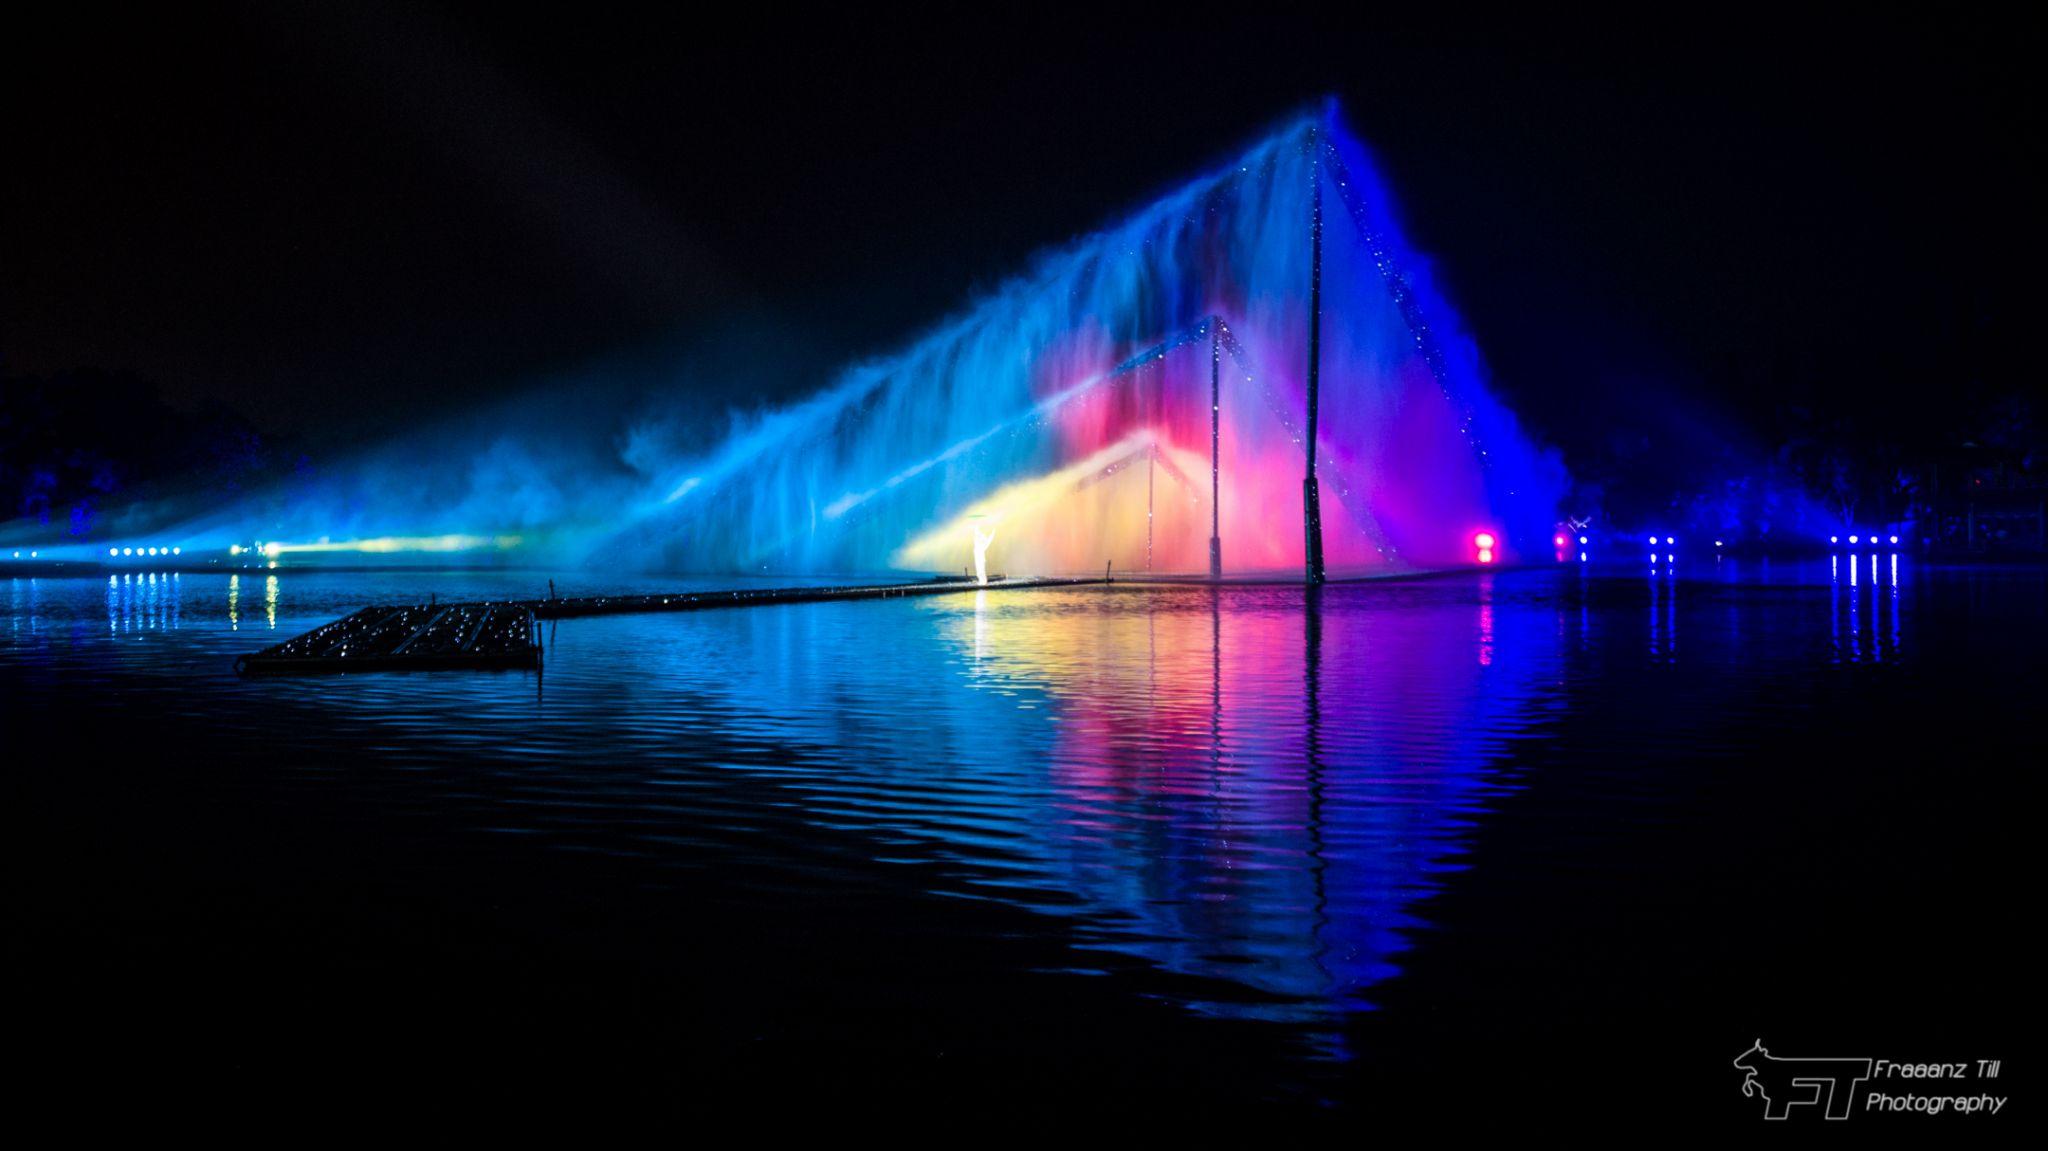 Hangzhou - Impression West Lake Show, China